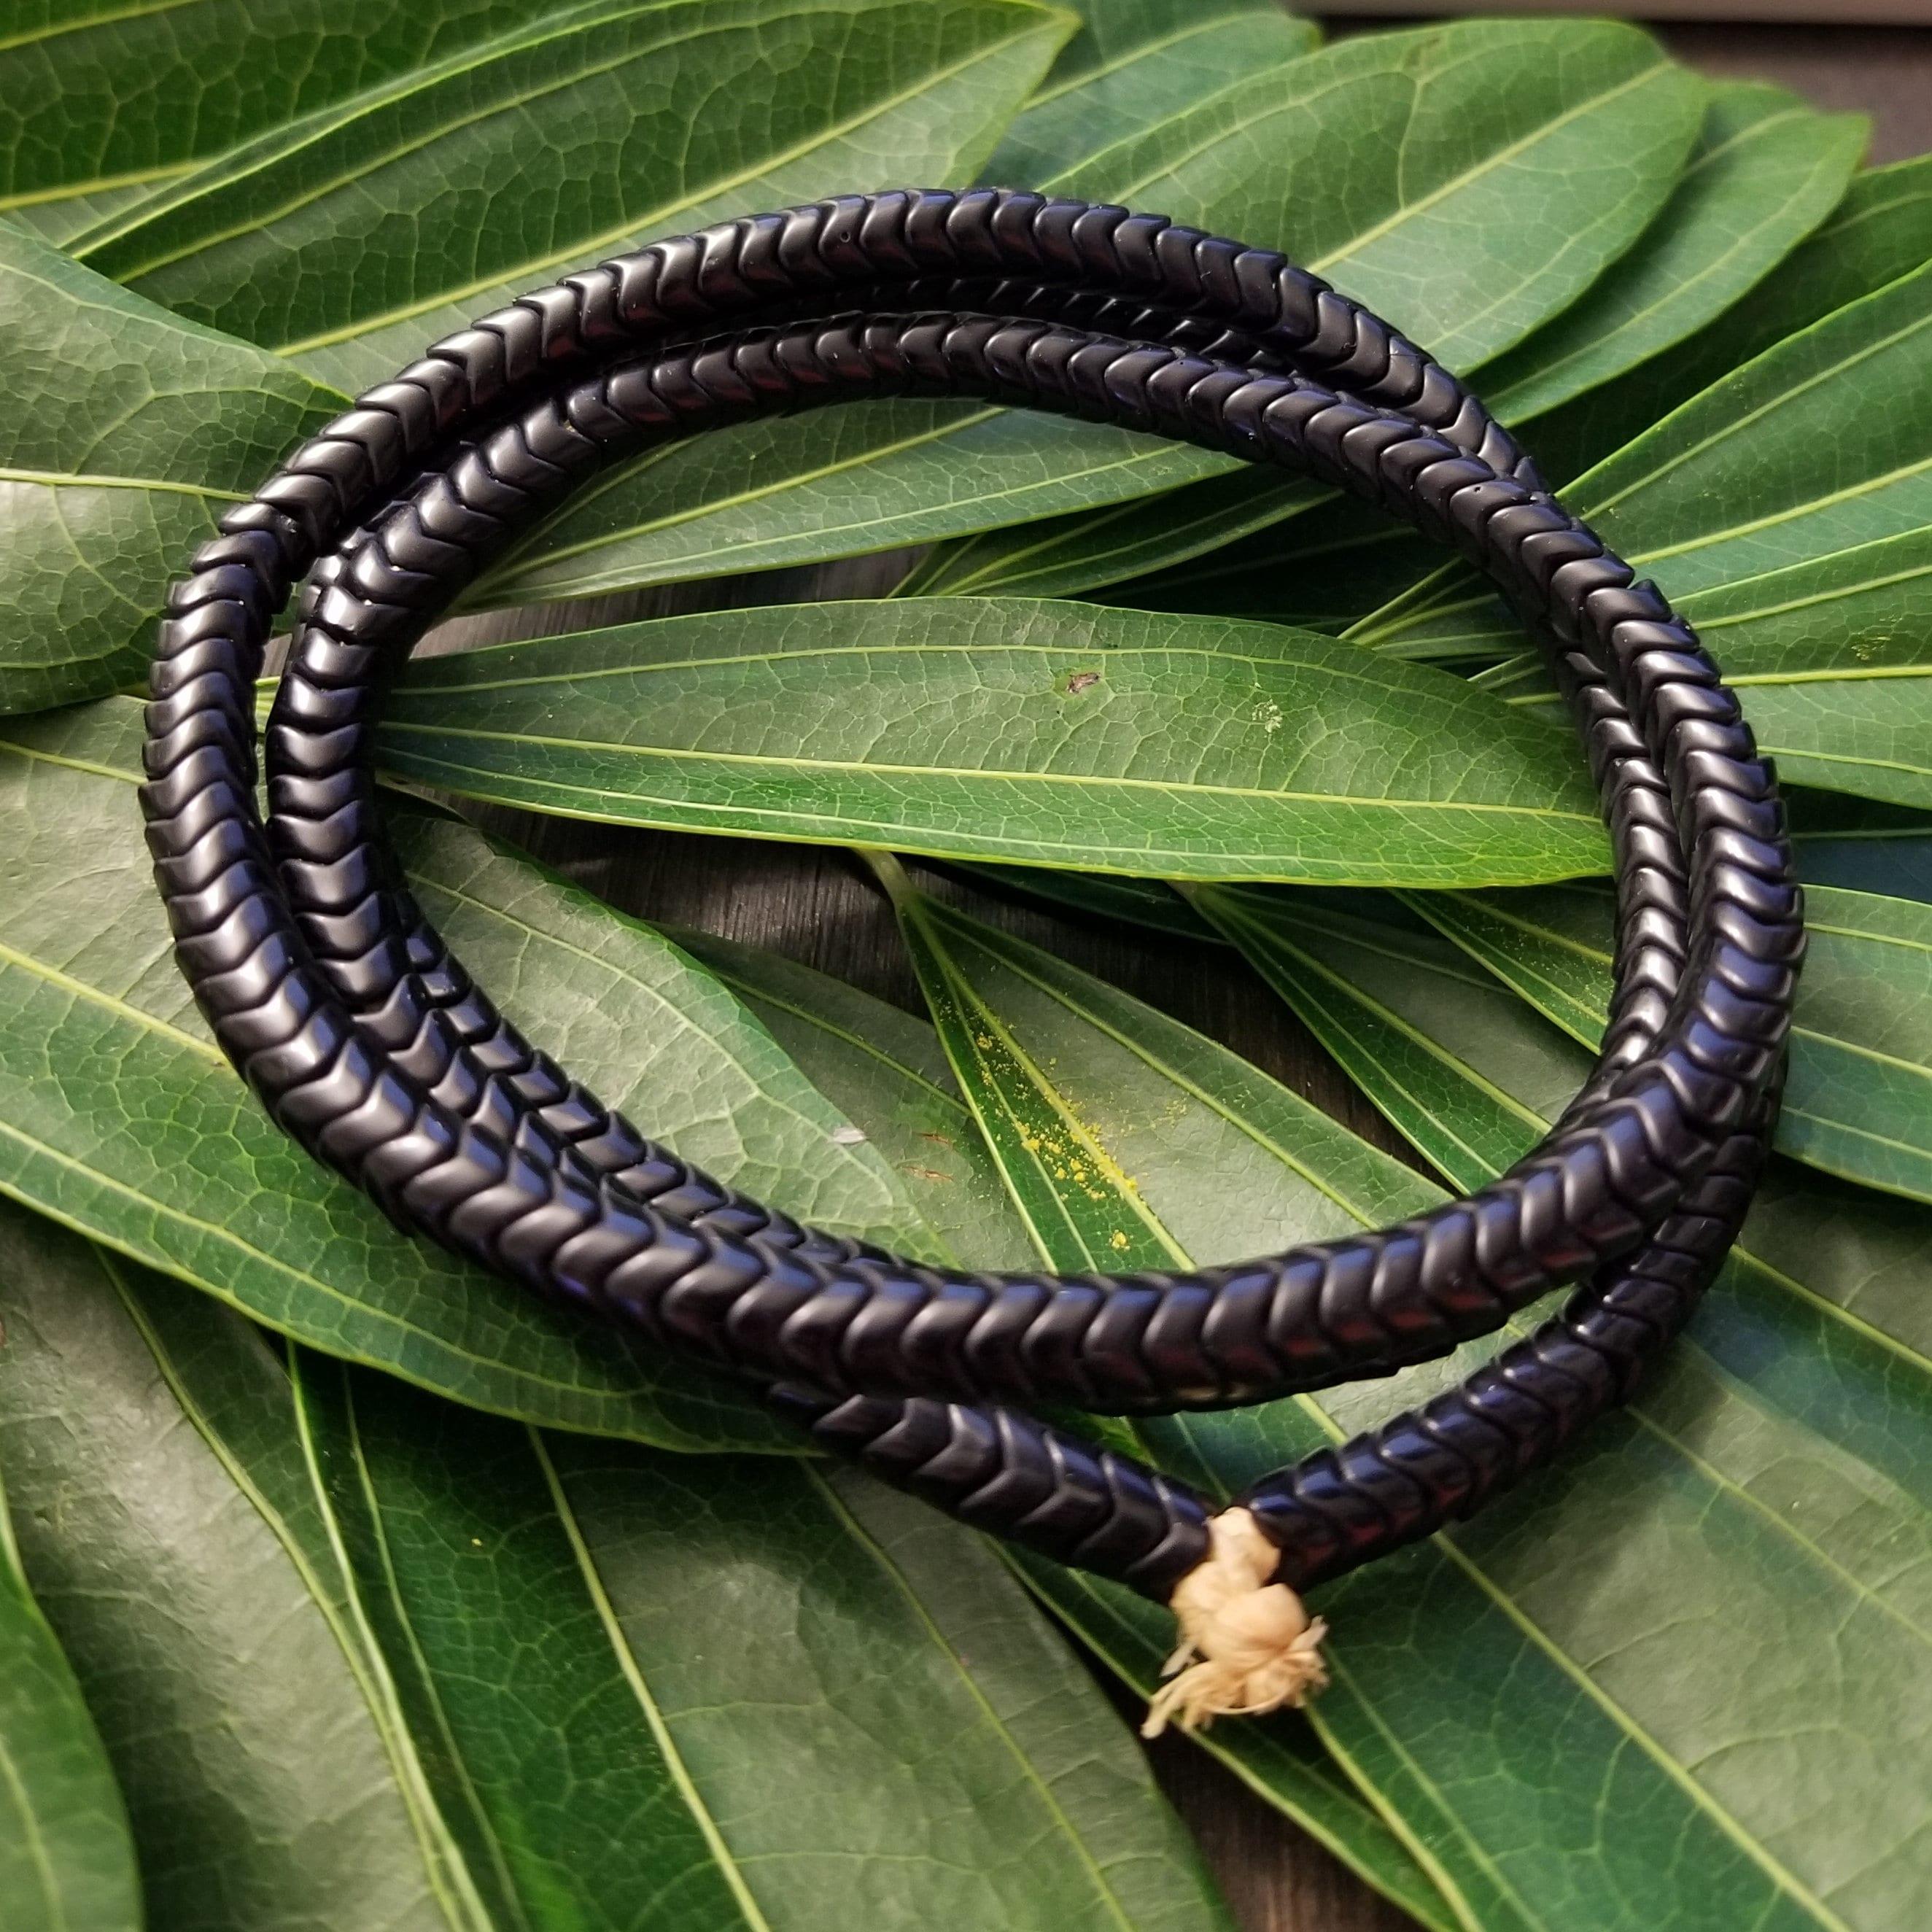 Black Glass Snake Beads 6mm Nigeria African Unusual 24 Inch Strand Handmade